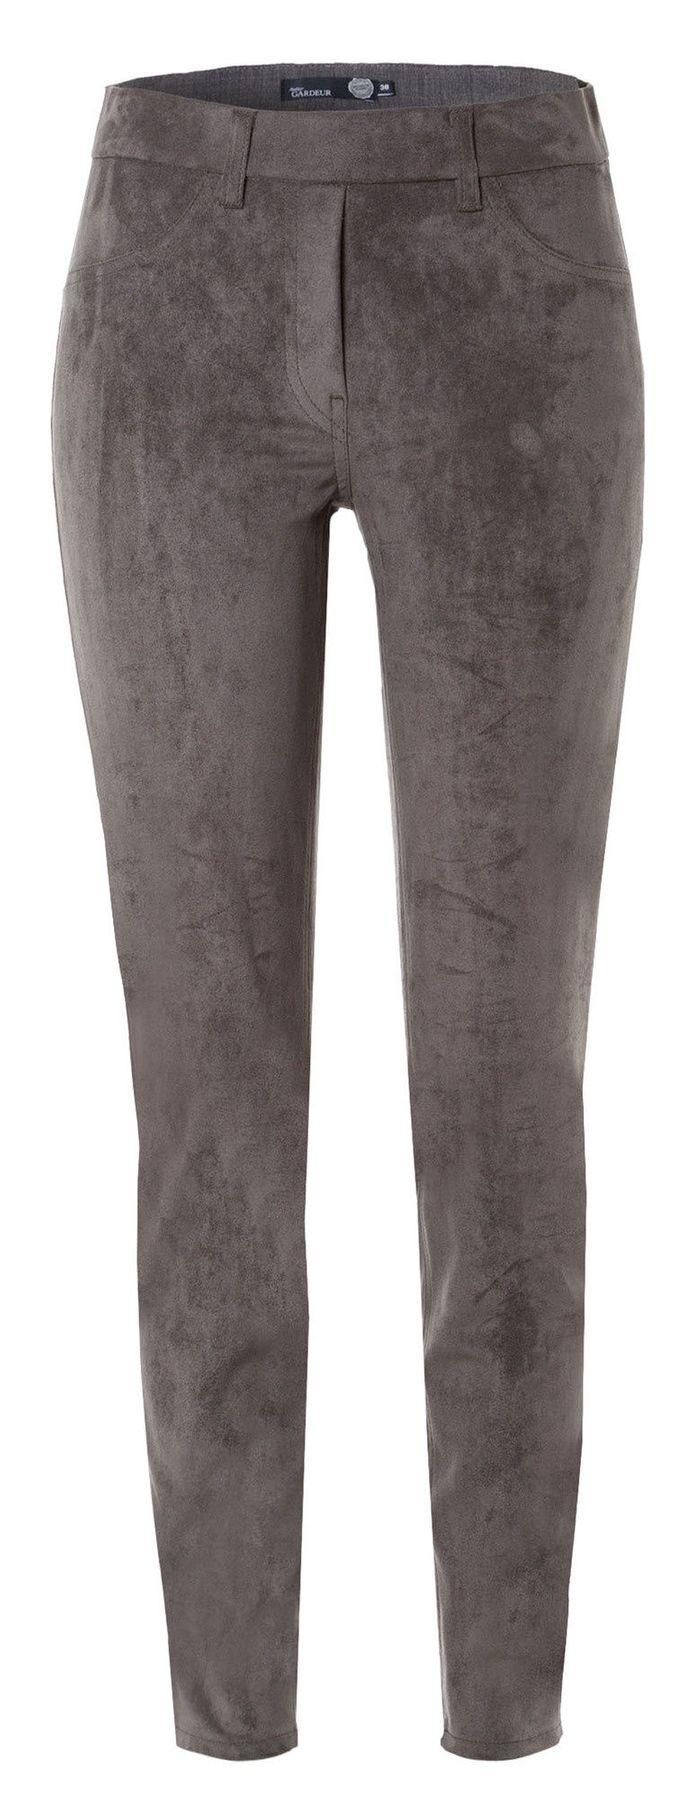 Atelier Gardeur - Modern Fit - Slip On Damenhose in Velourslederoptik Zeggi4 (600711) – Bild 7